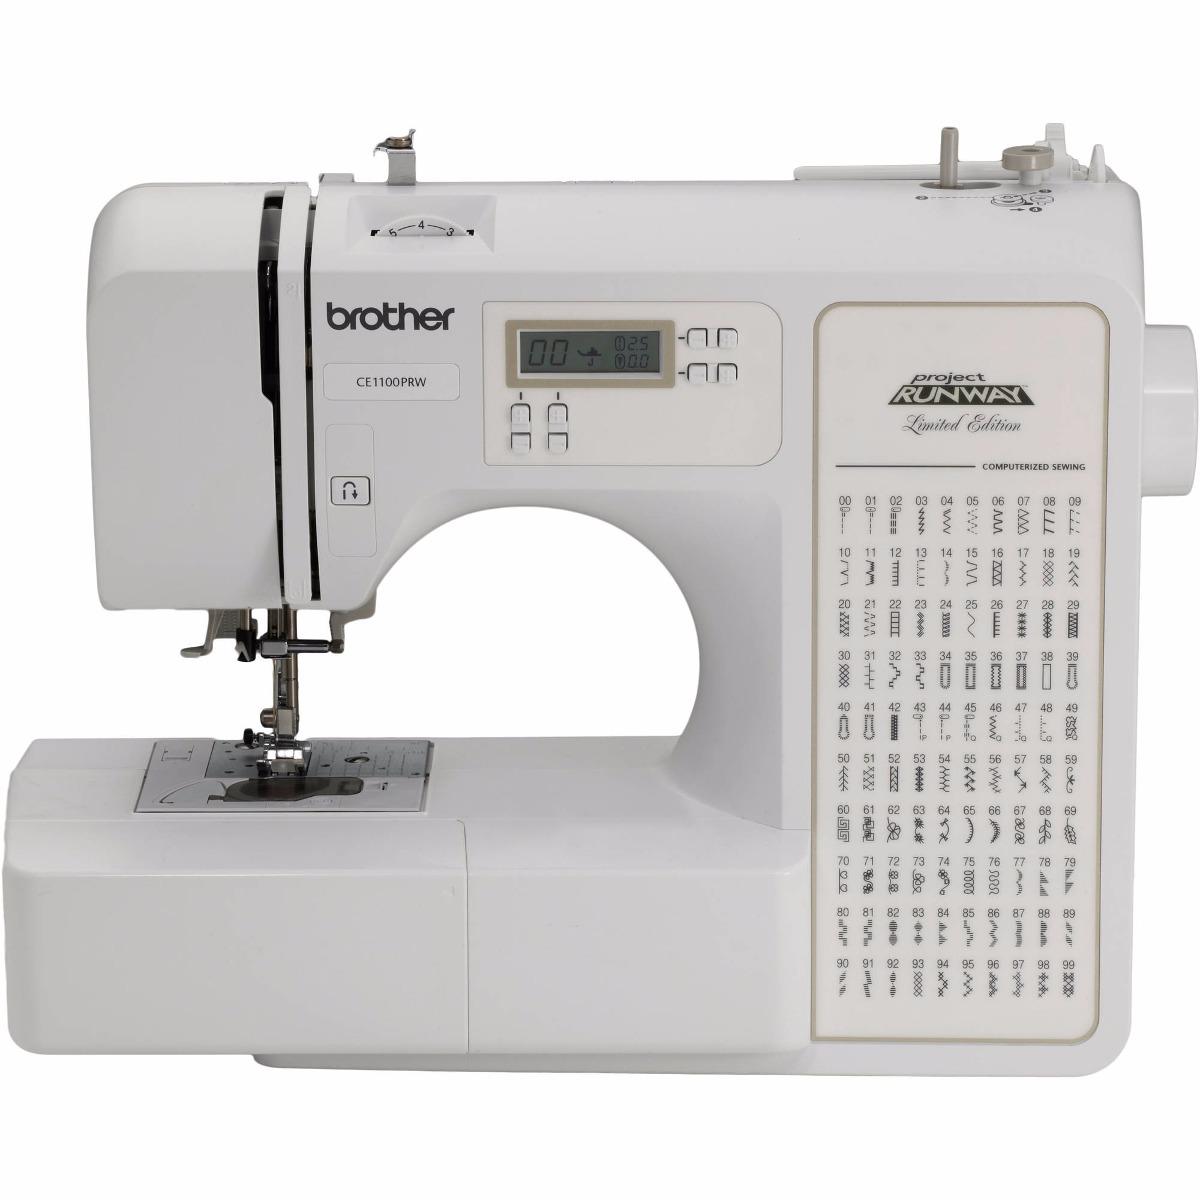 Maquina De Coser Brother Ce1100prw Computarizada 100